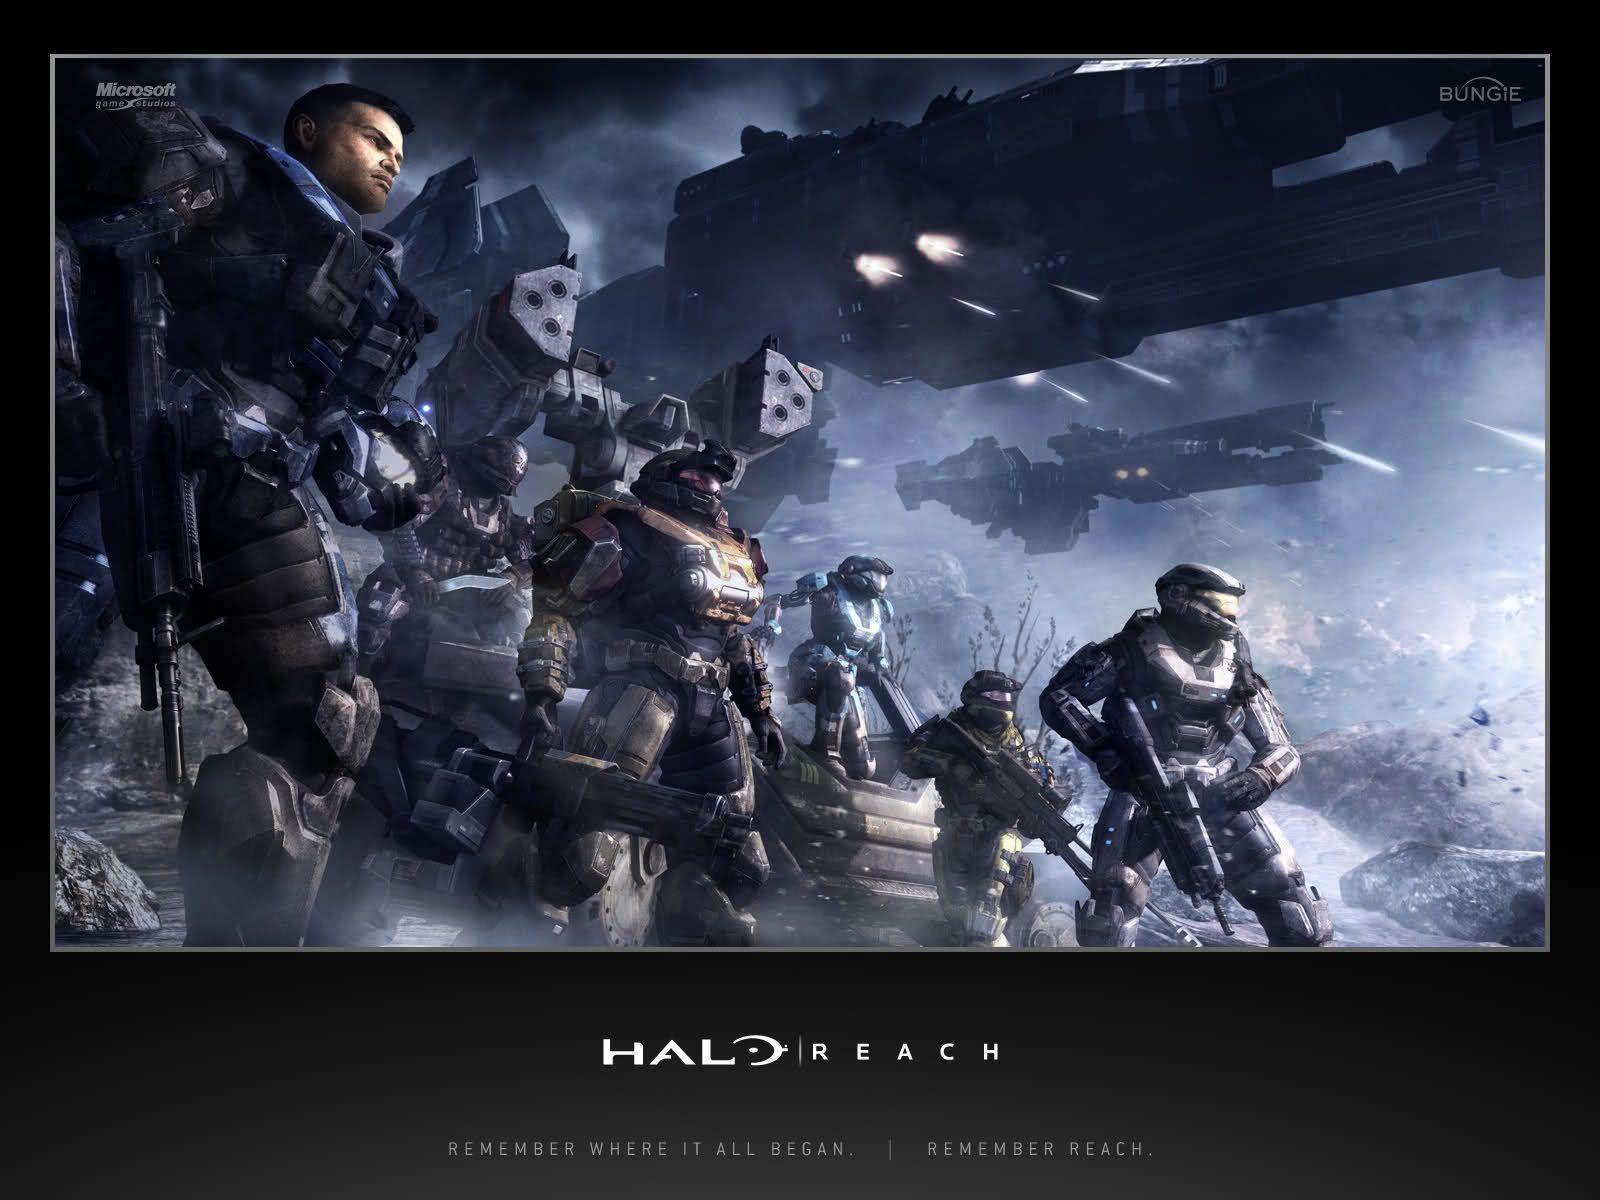 Noble Team Halo Reach Halo Game Halo Master Chief